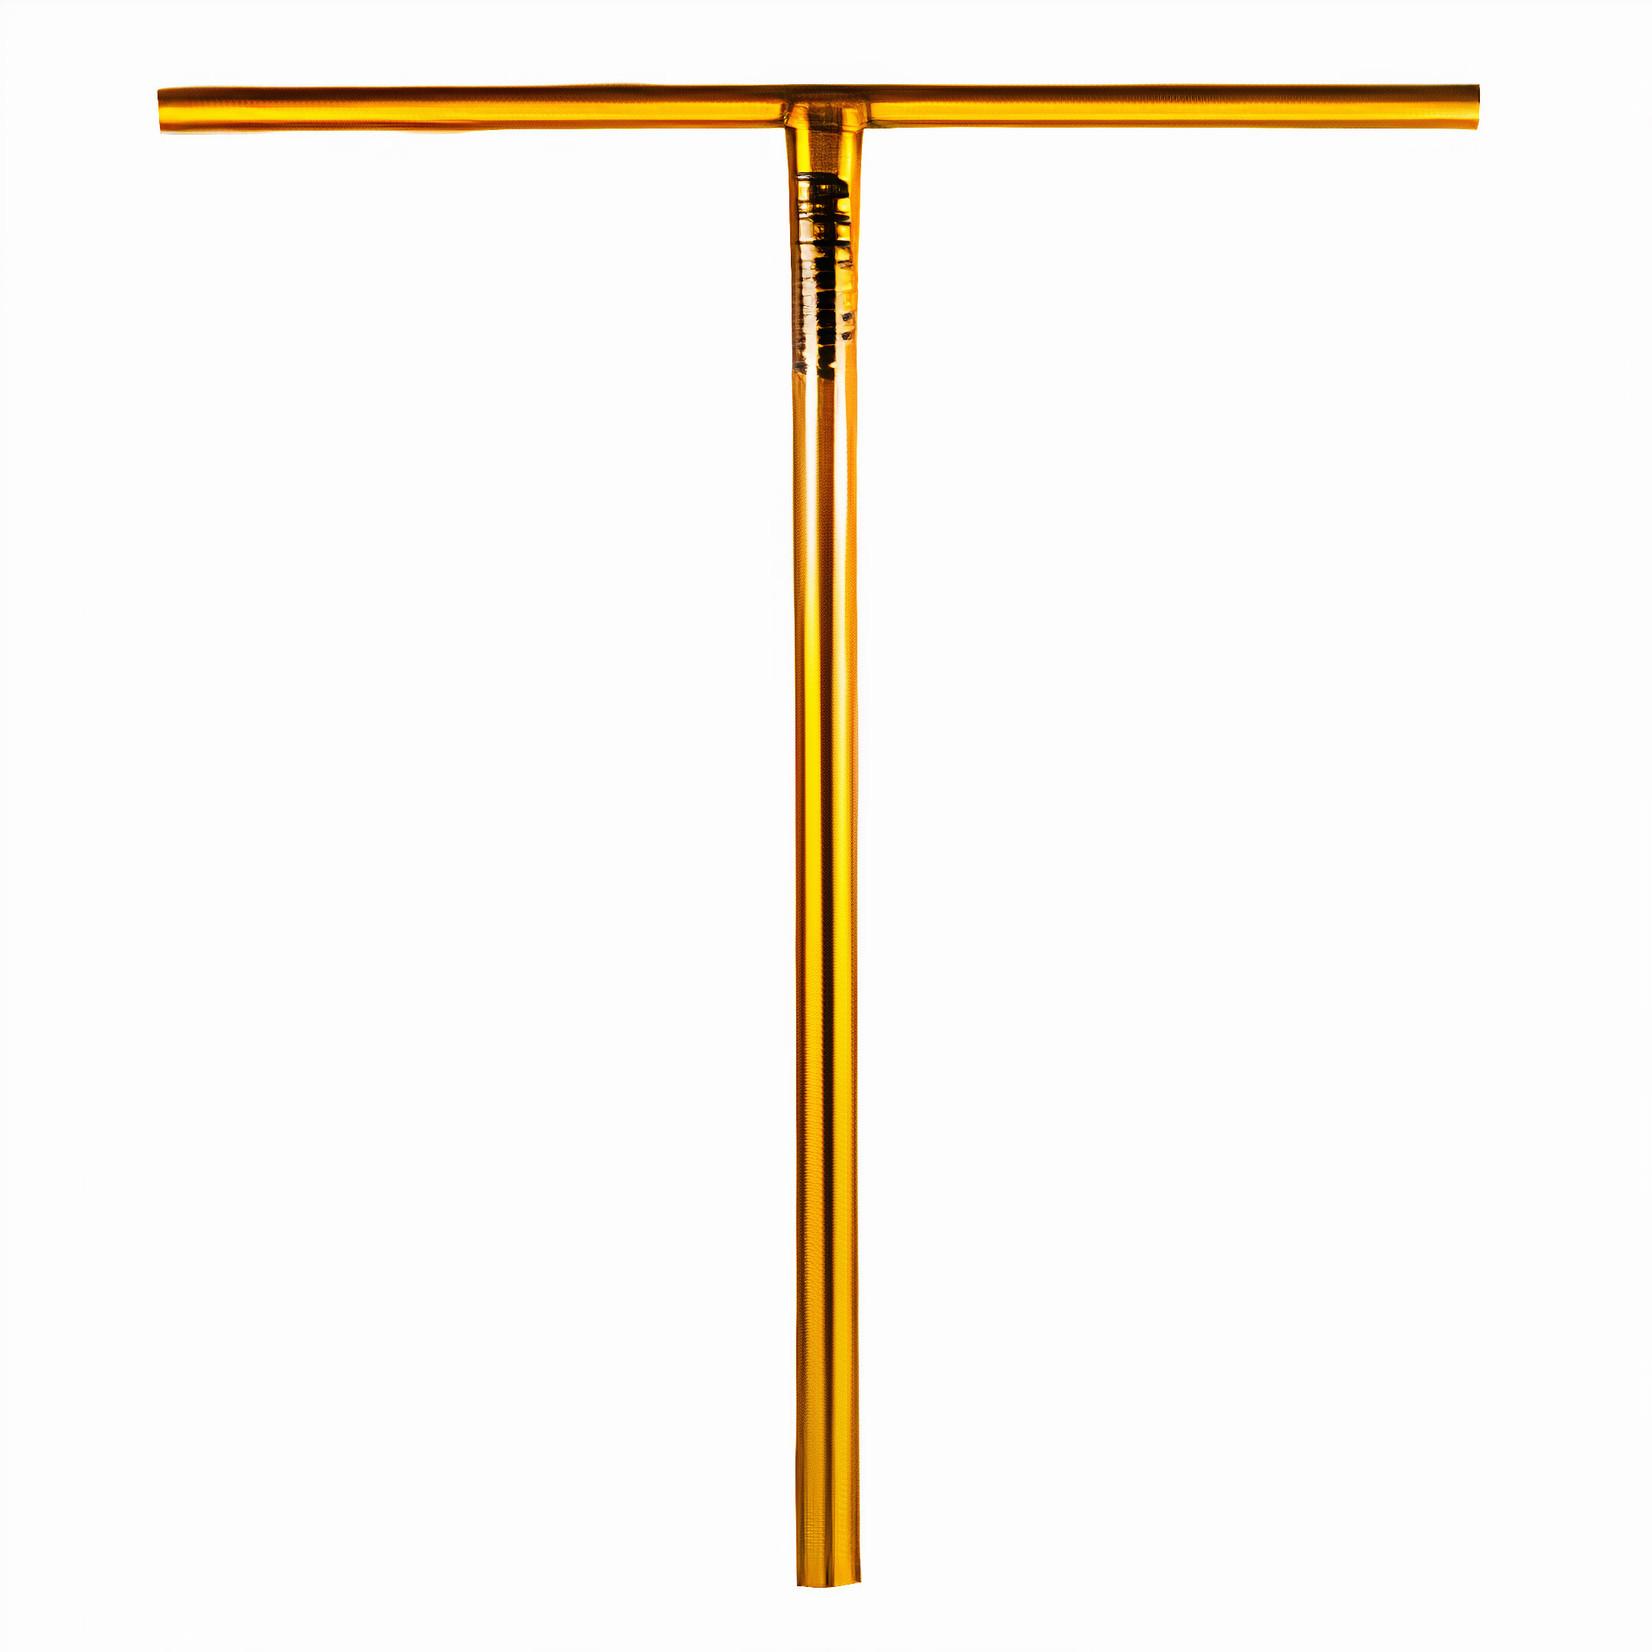 Affinity Affinity - Signature T-Bar Nick Donatelli - Standard XL - Trans Gold